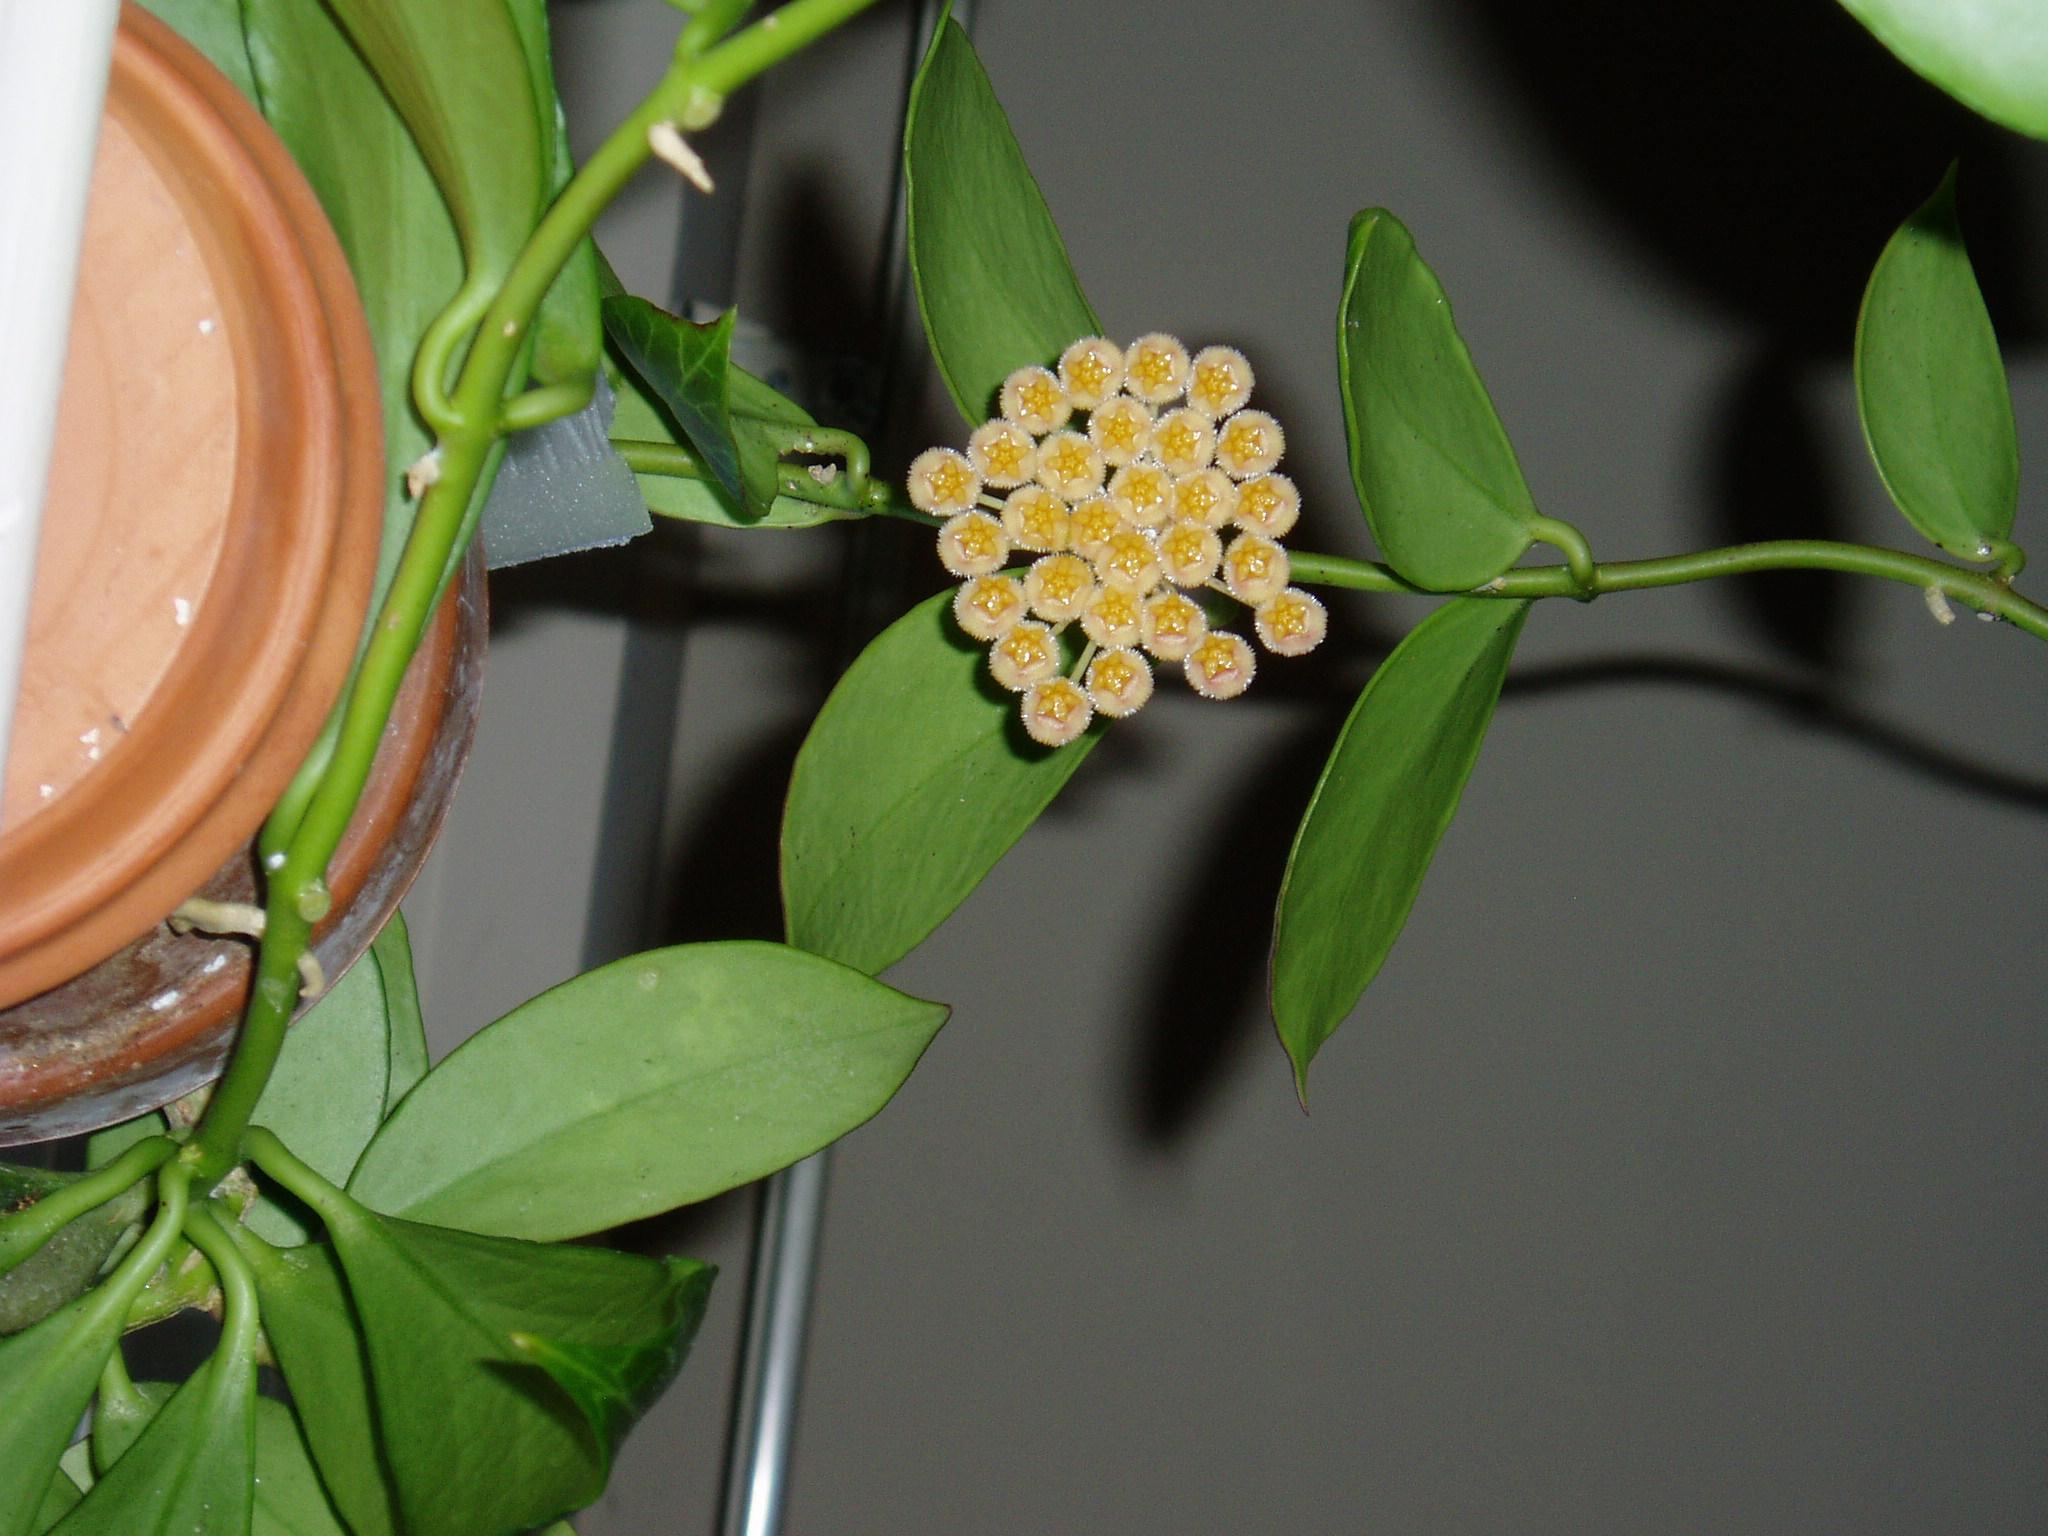 Hoya Obscura Wikipedia